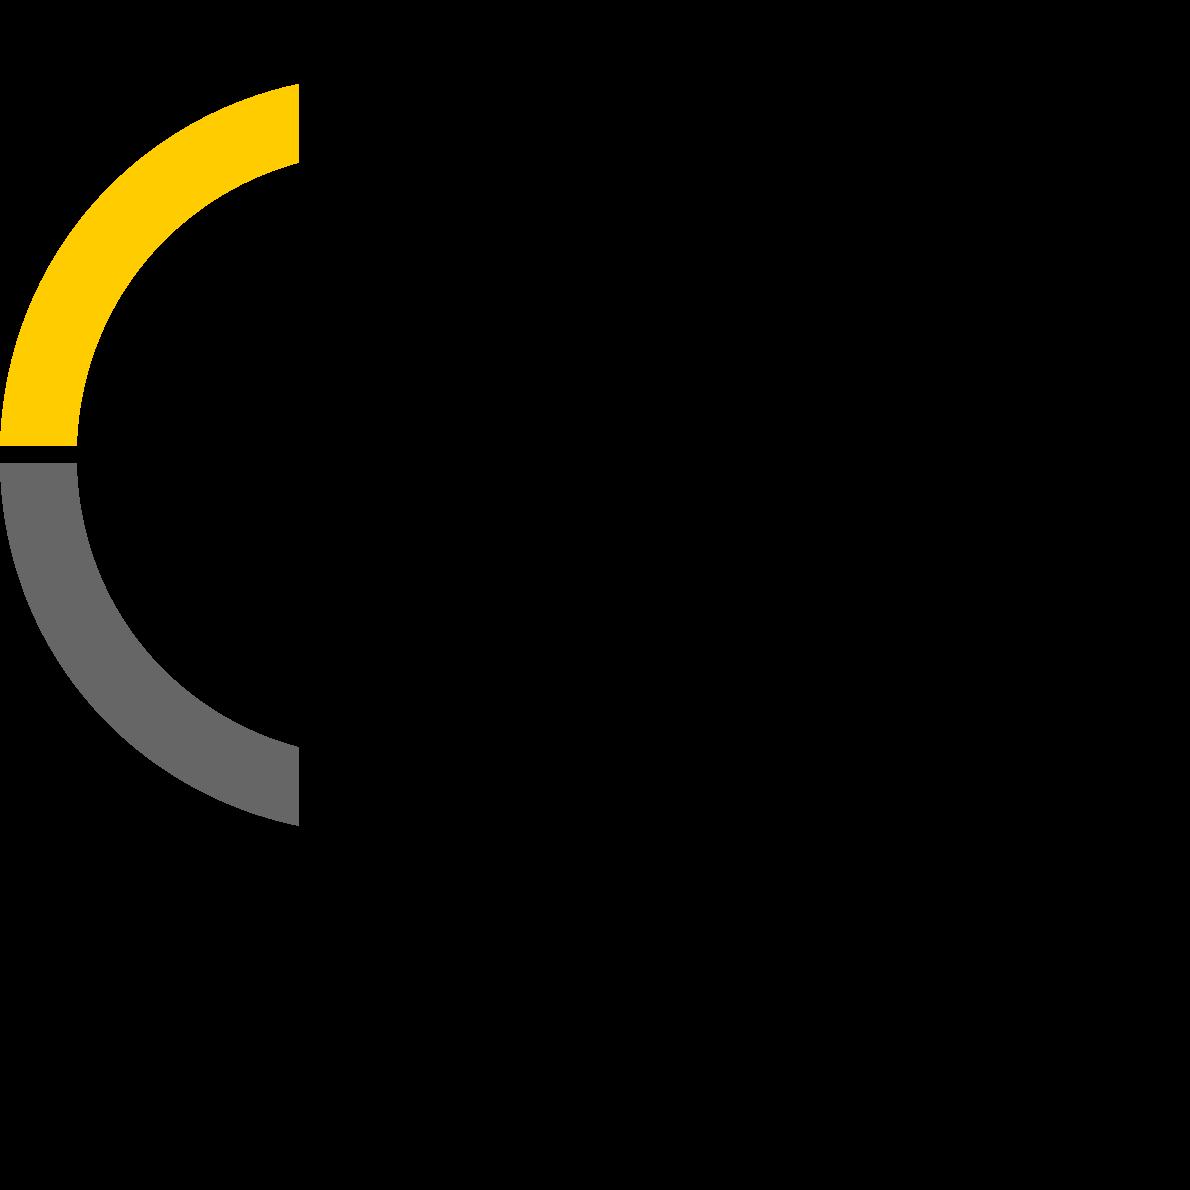 Company logo of OTT HydroMet GmbH